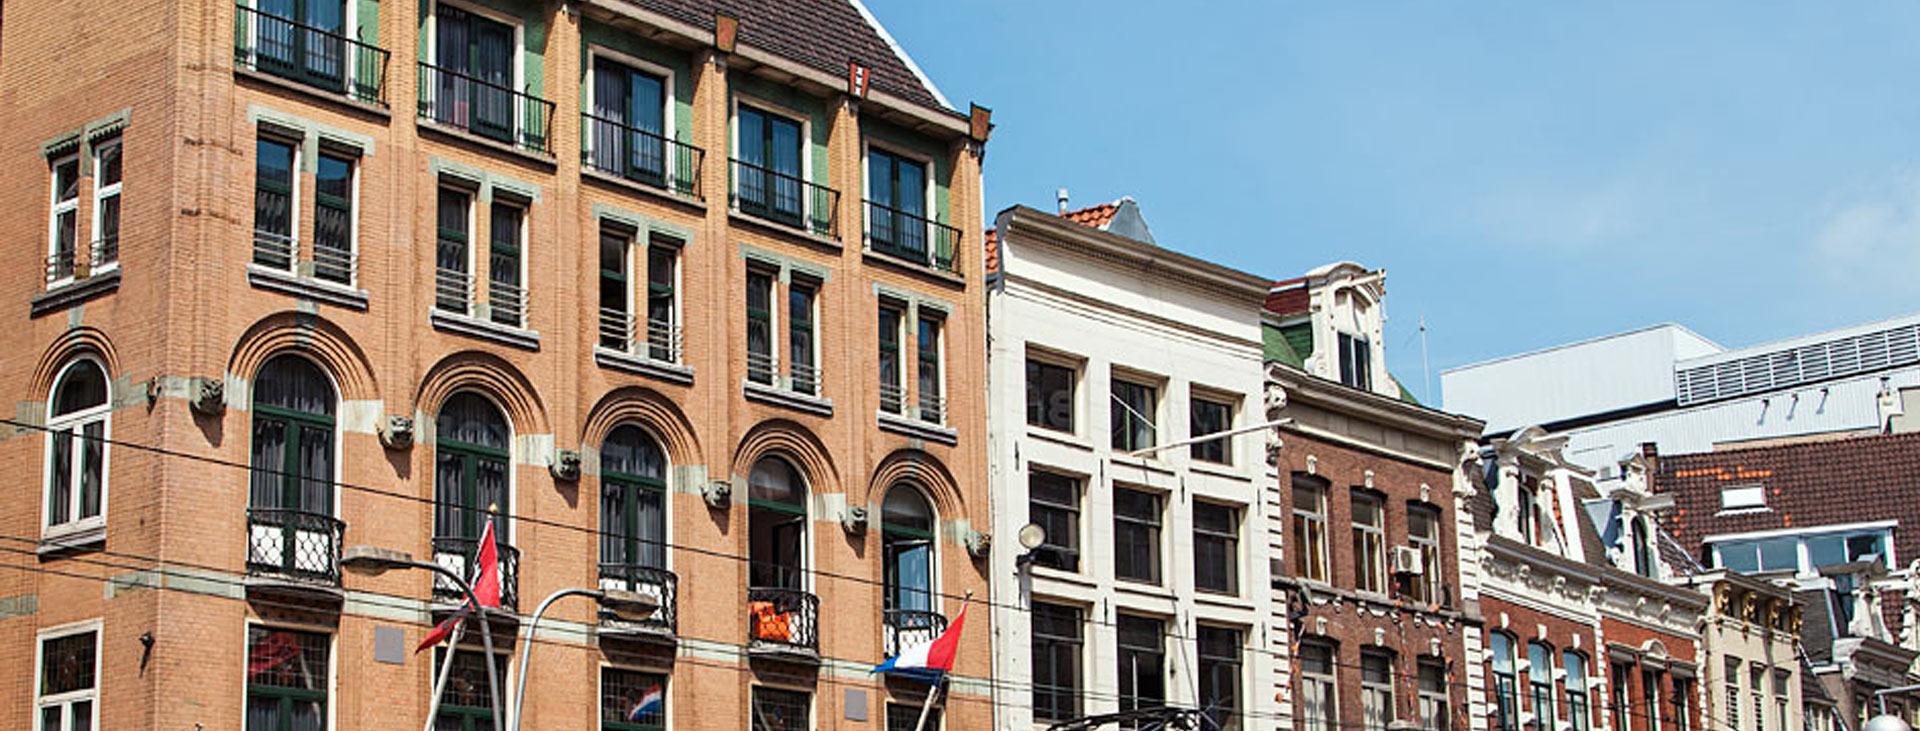 Amsterdam De Roode Leeuw, Amsterdam, Nederländerna